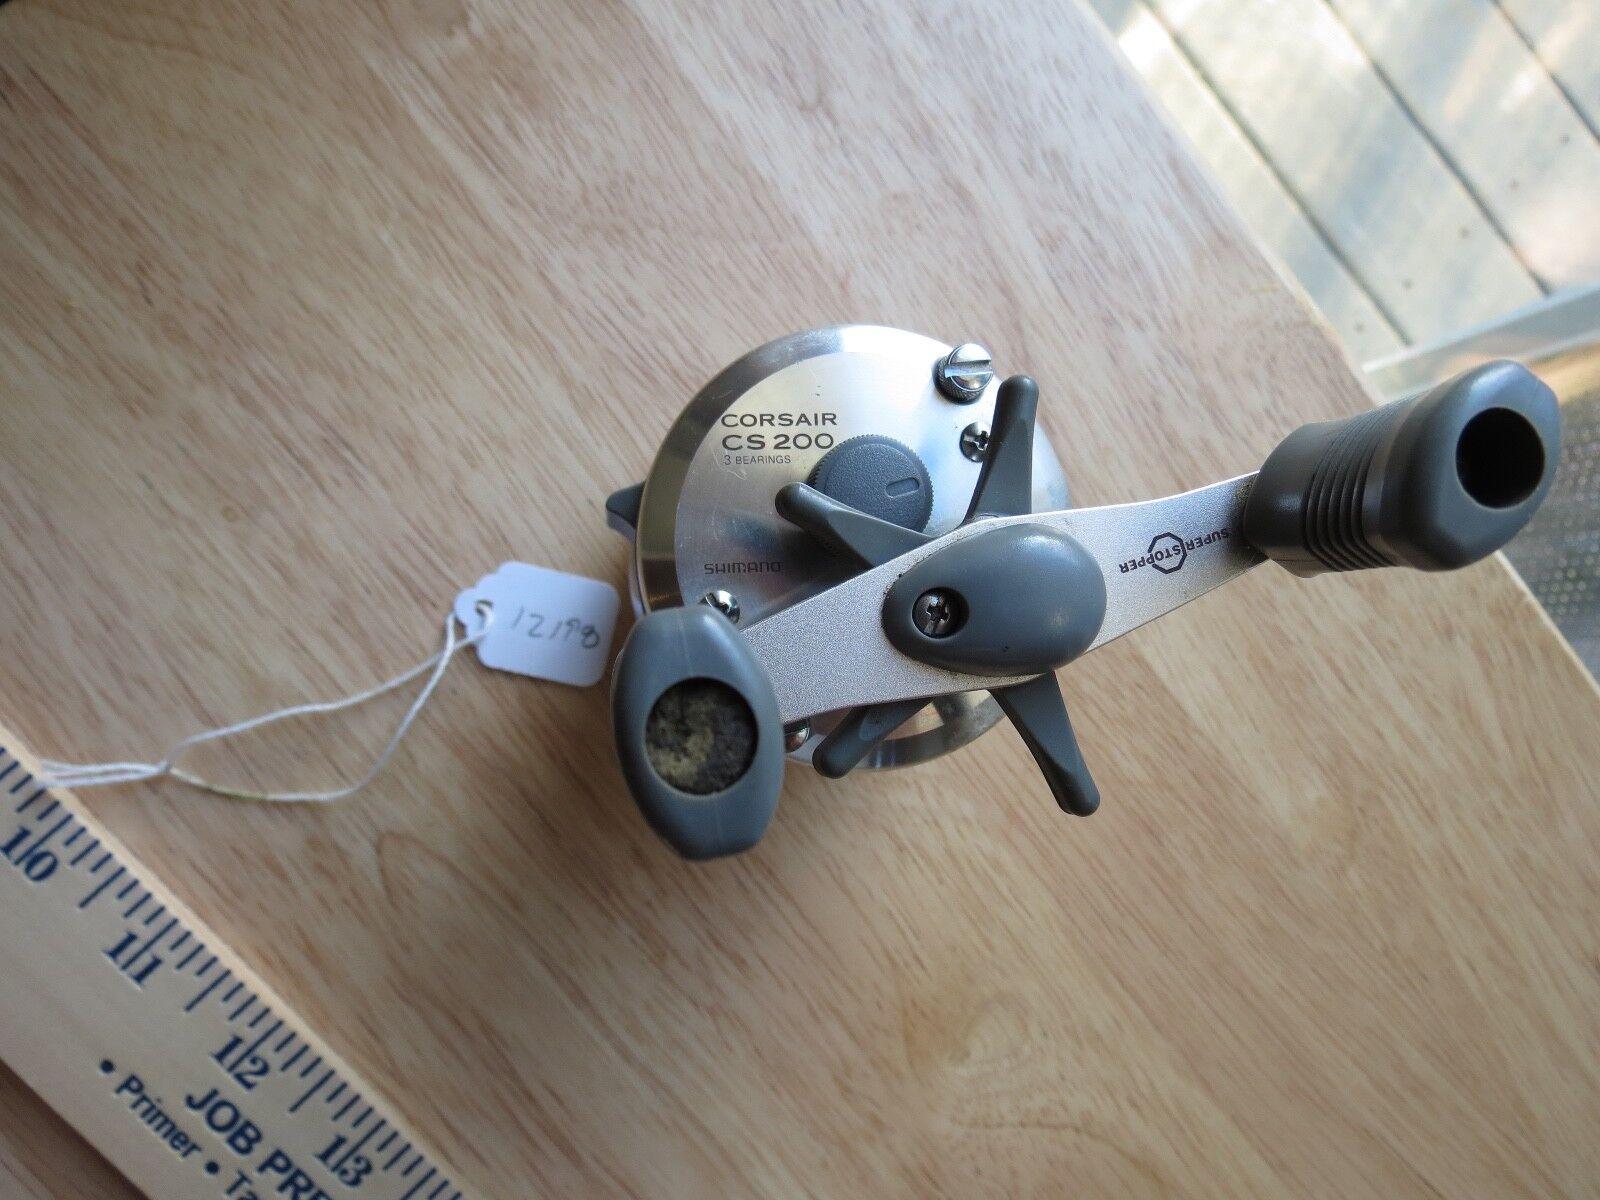 Shimano Cosair CS 200  fishing reel  (lot)  free shipping